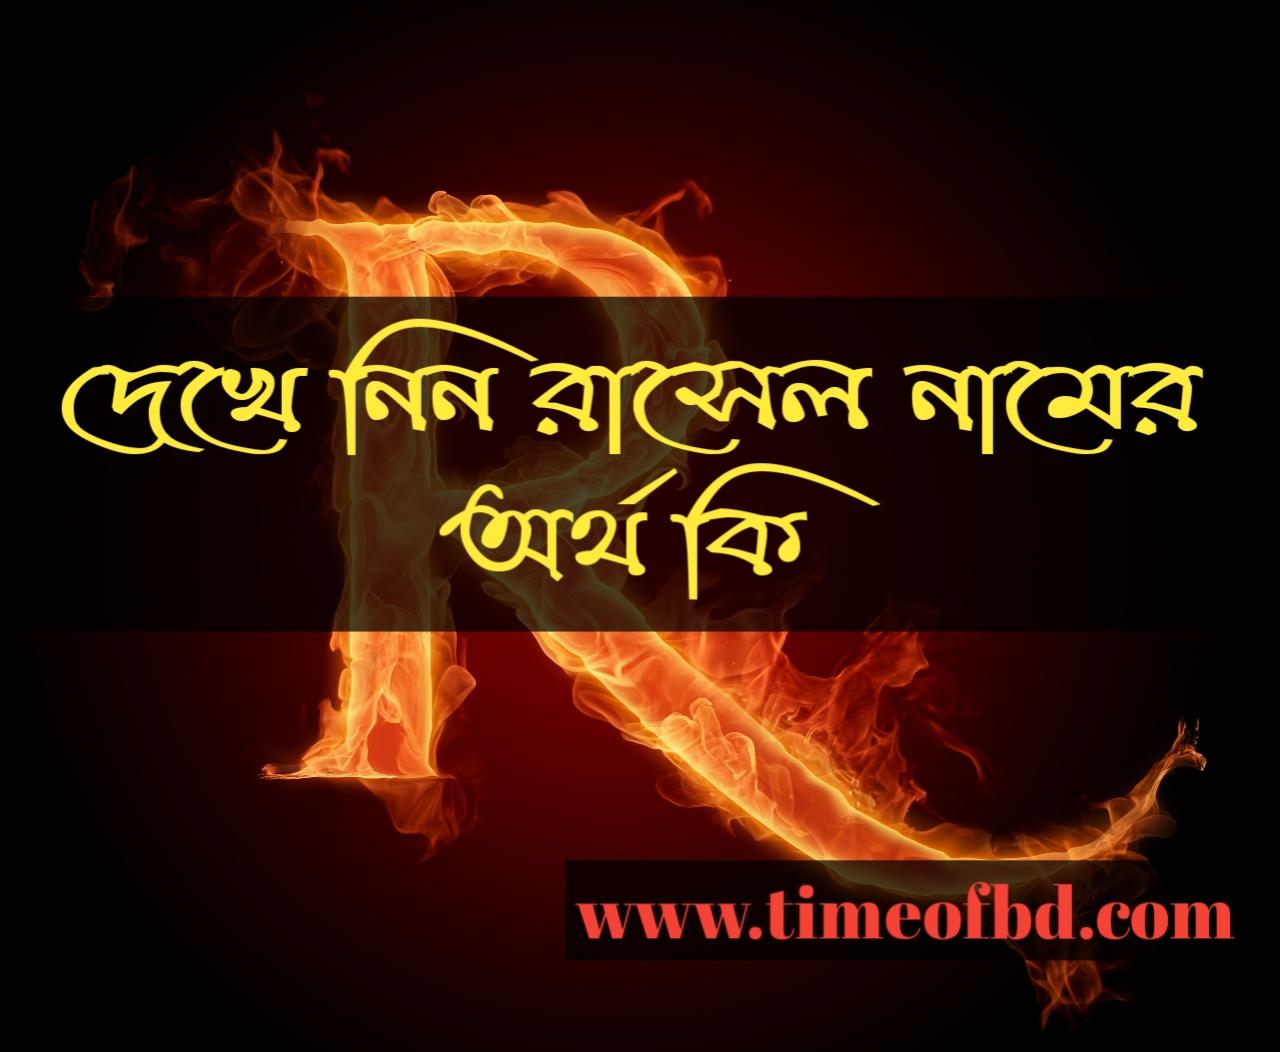 Rasel name meaning in Bengali, রাসেল নামের অর্থ কি, রাসেল নামের বাংলা অর্থ কি, রাসেল নামের ইসলামিক অর্থ কি,